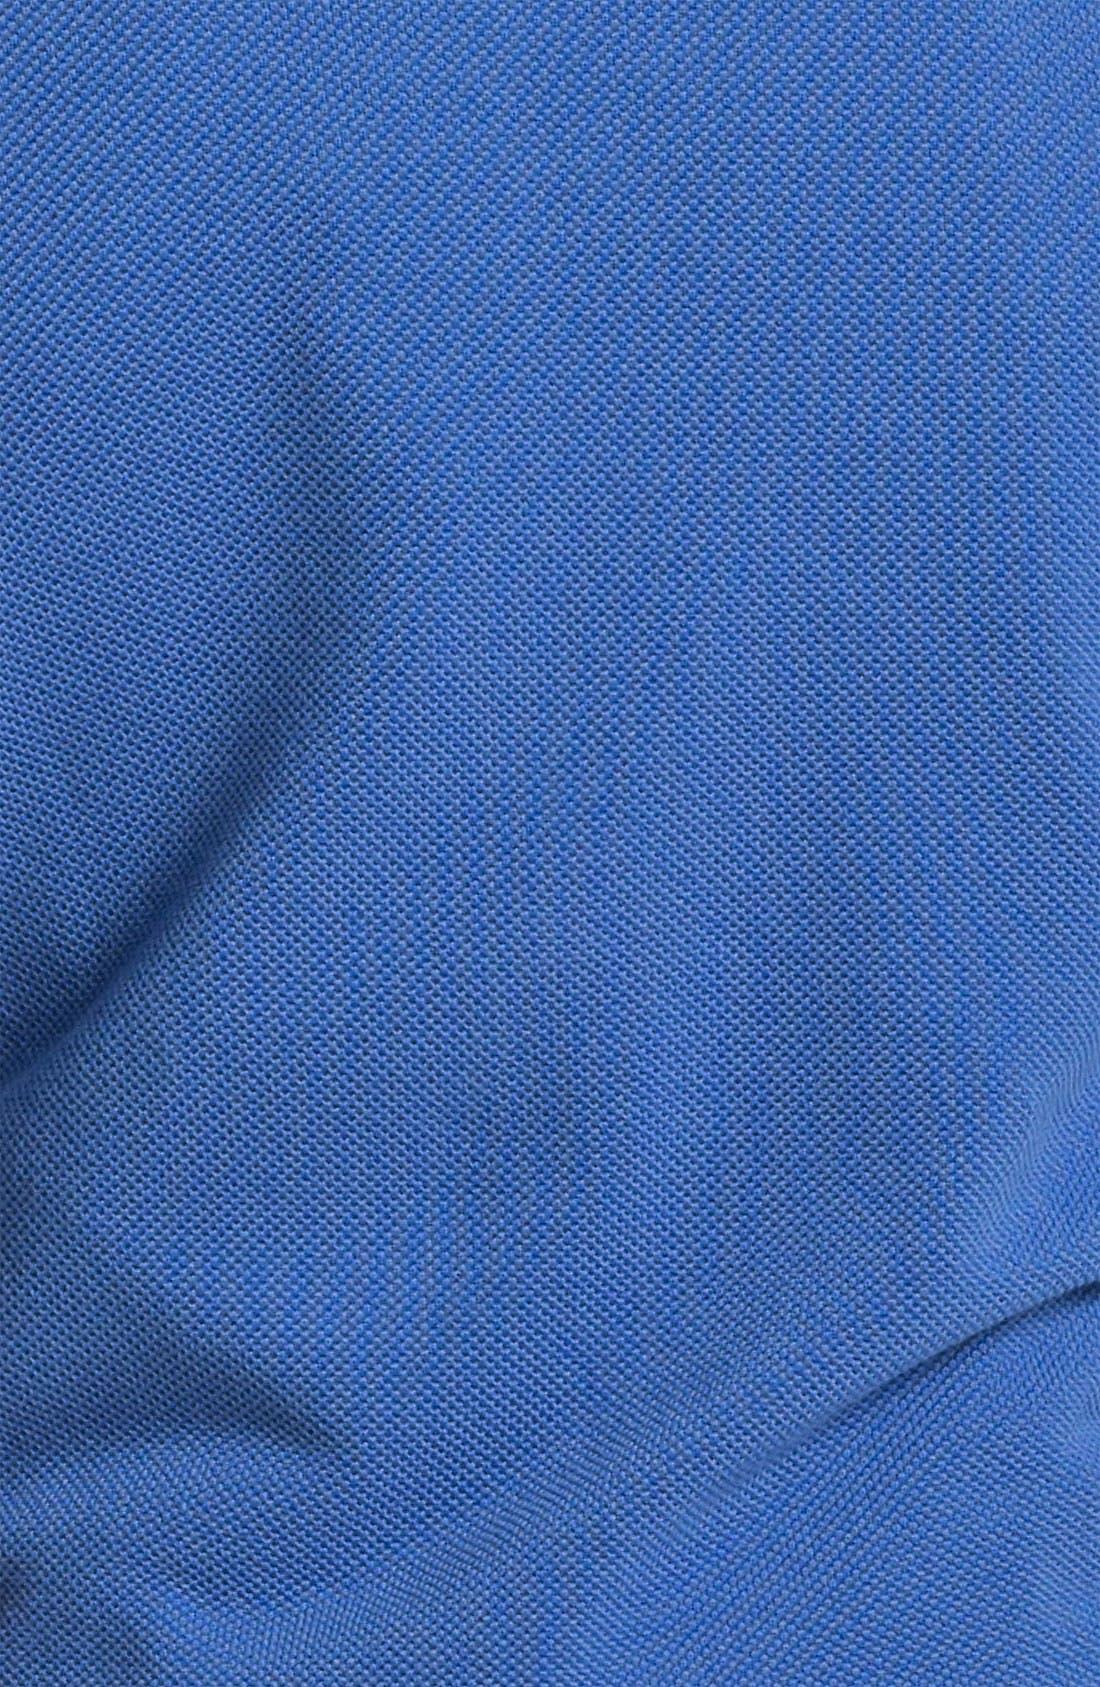 Alternate Image 3  - Brooks Brothers V-Neck Supima® Cotton Sweater